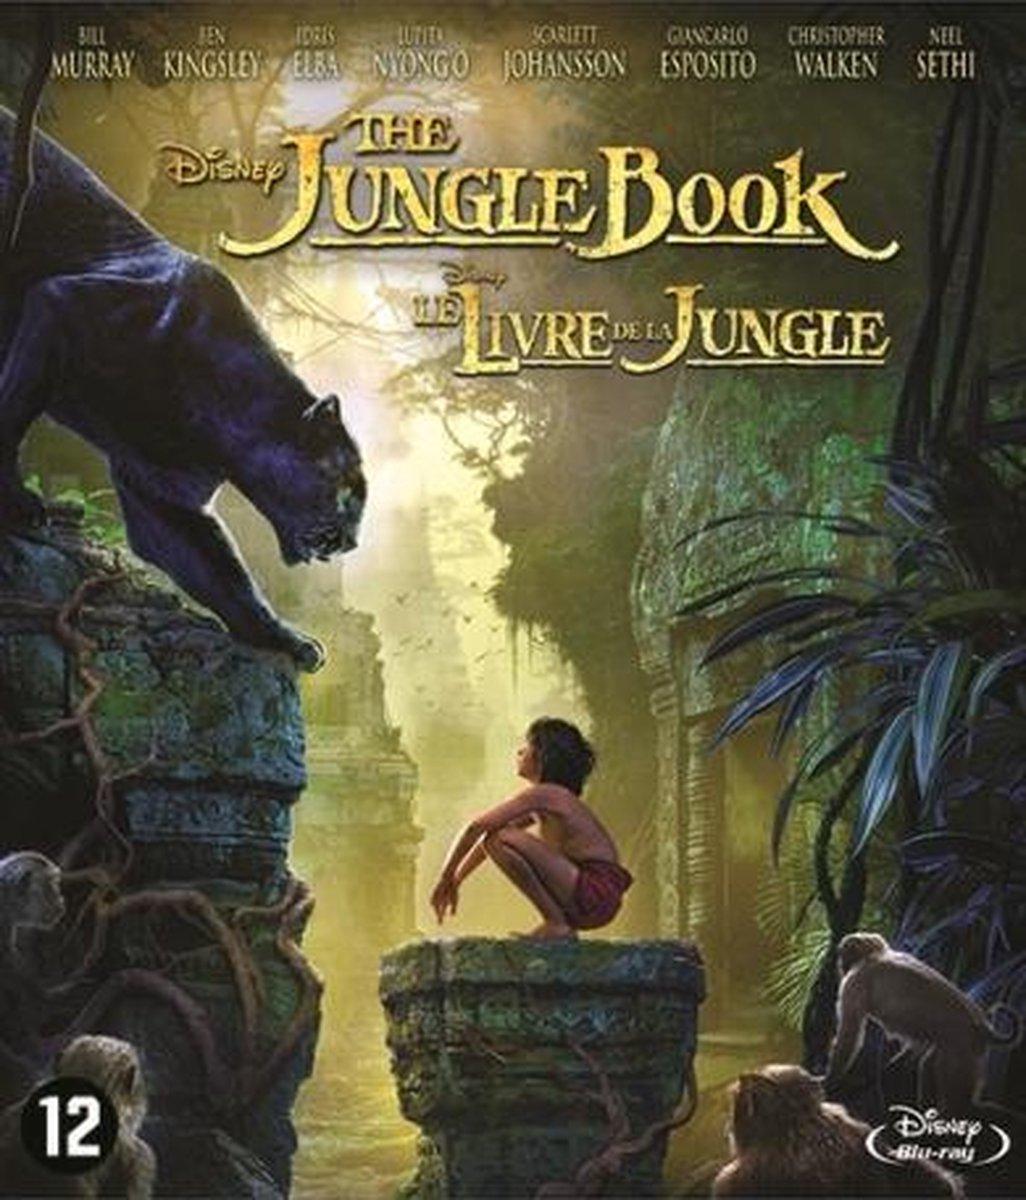 The Jungle Book (2016) (Blu-ray) - Movie